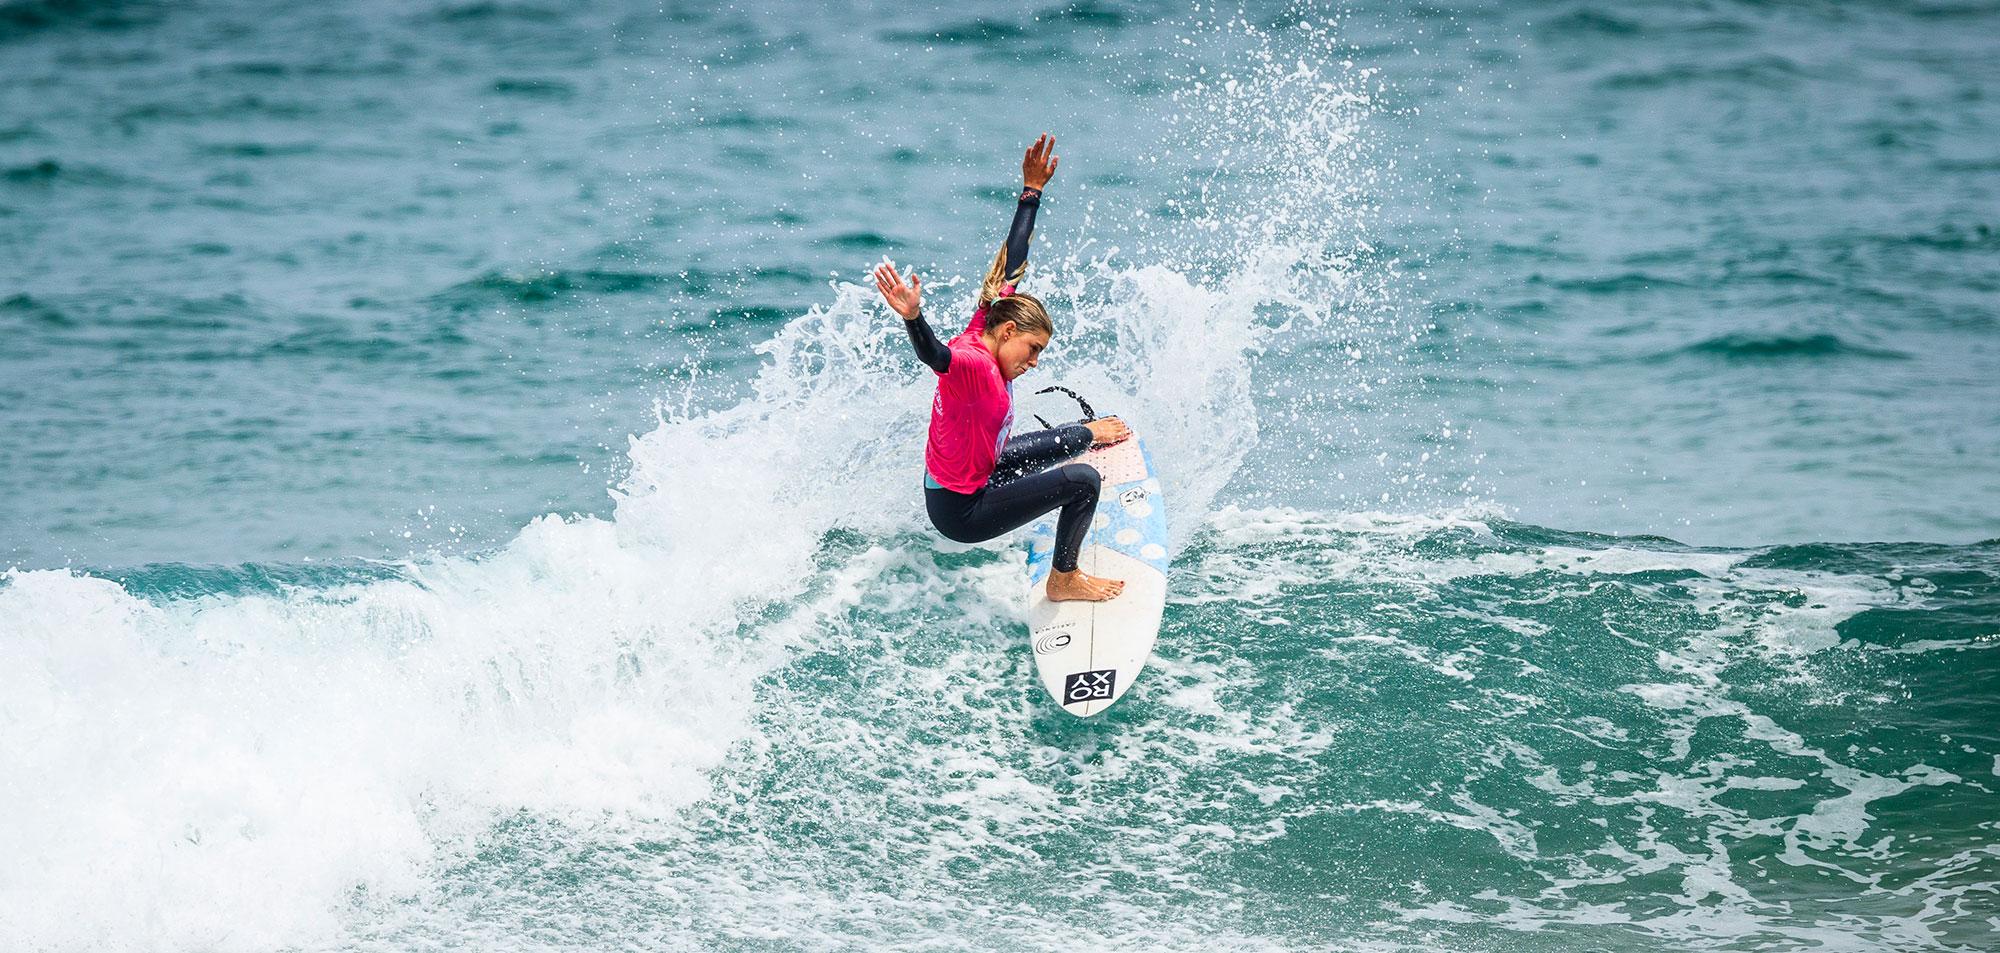 Janire Gonzalez Etxabarri on a Cabianca Surfboard